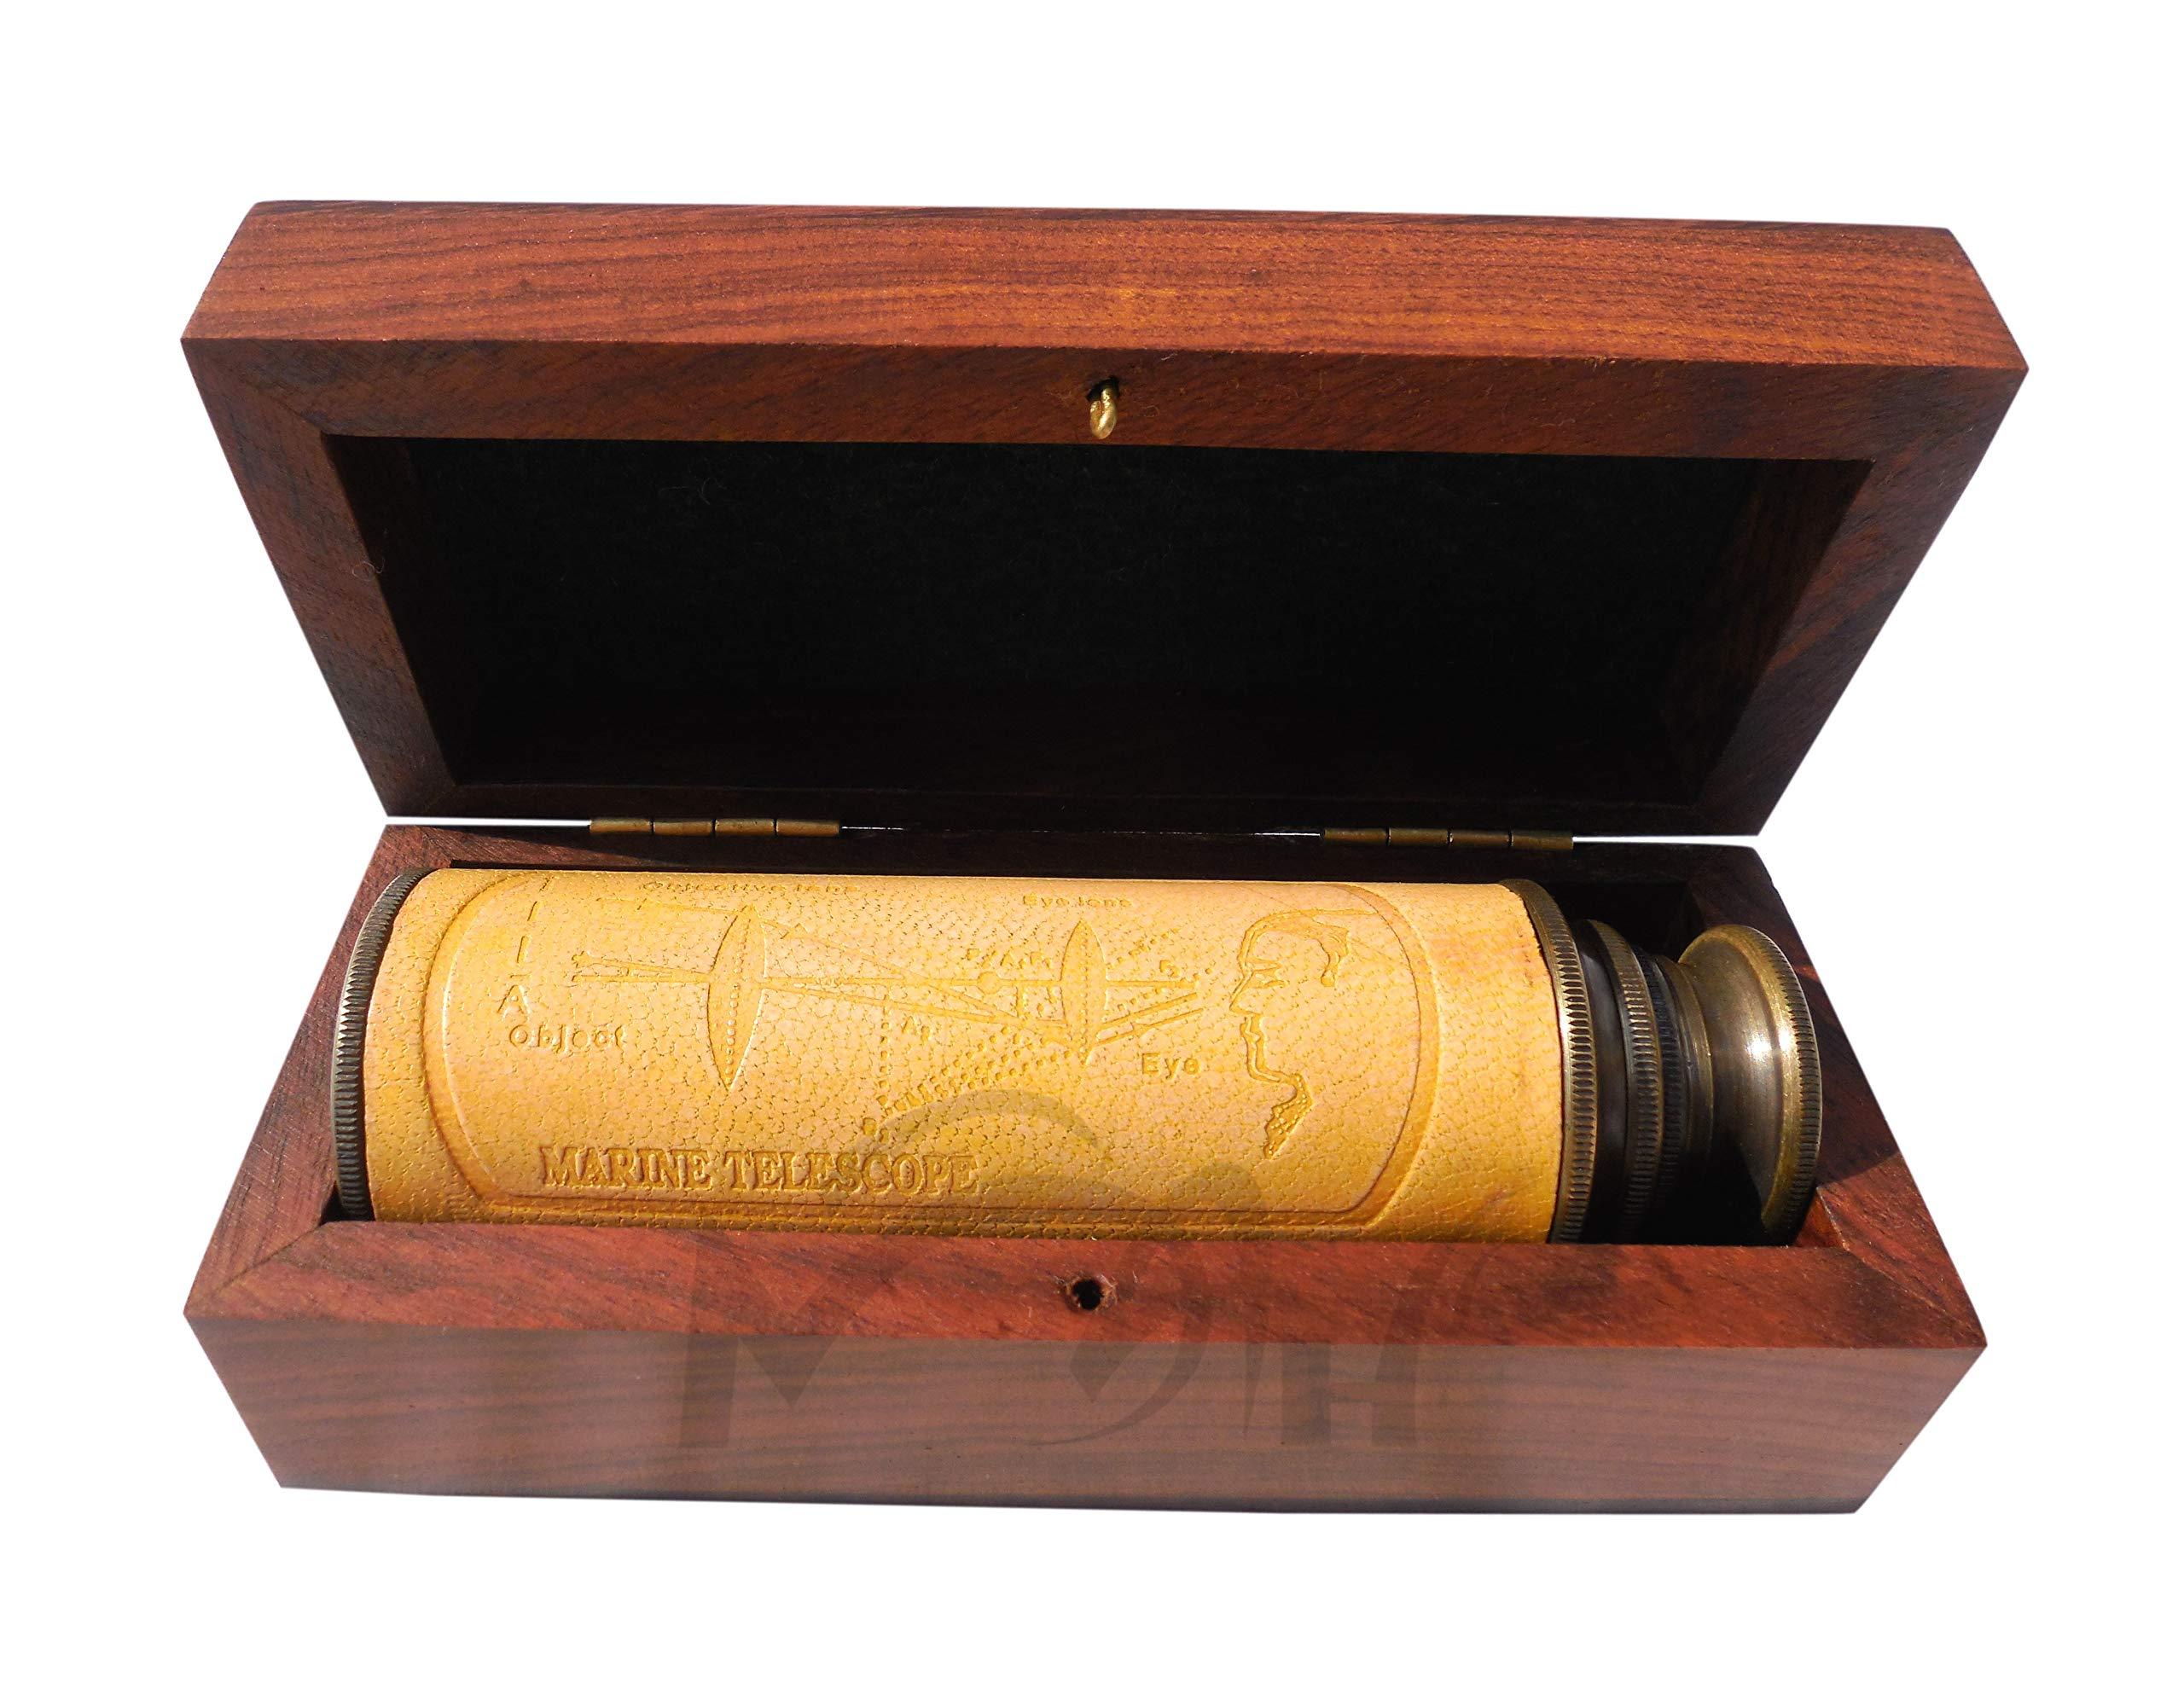 MAH 12 Inch Brass Ship Captain Telescope/Spyglass with Wooden Box. C-3132